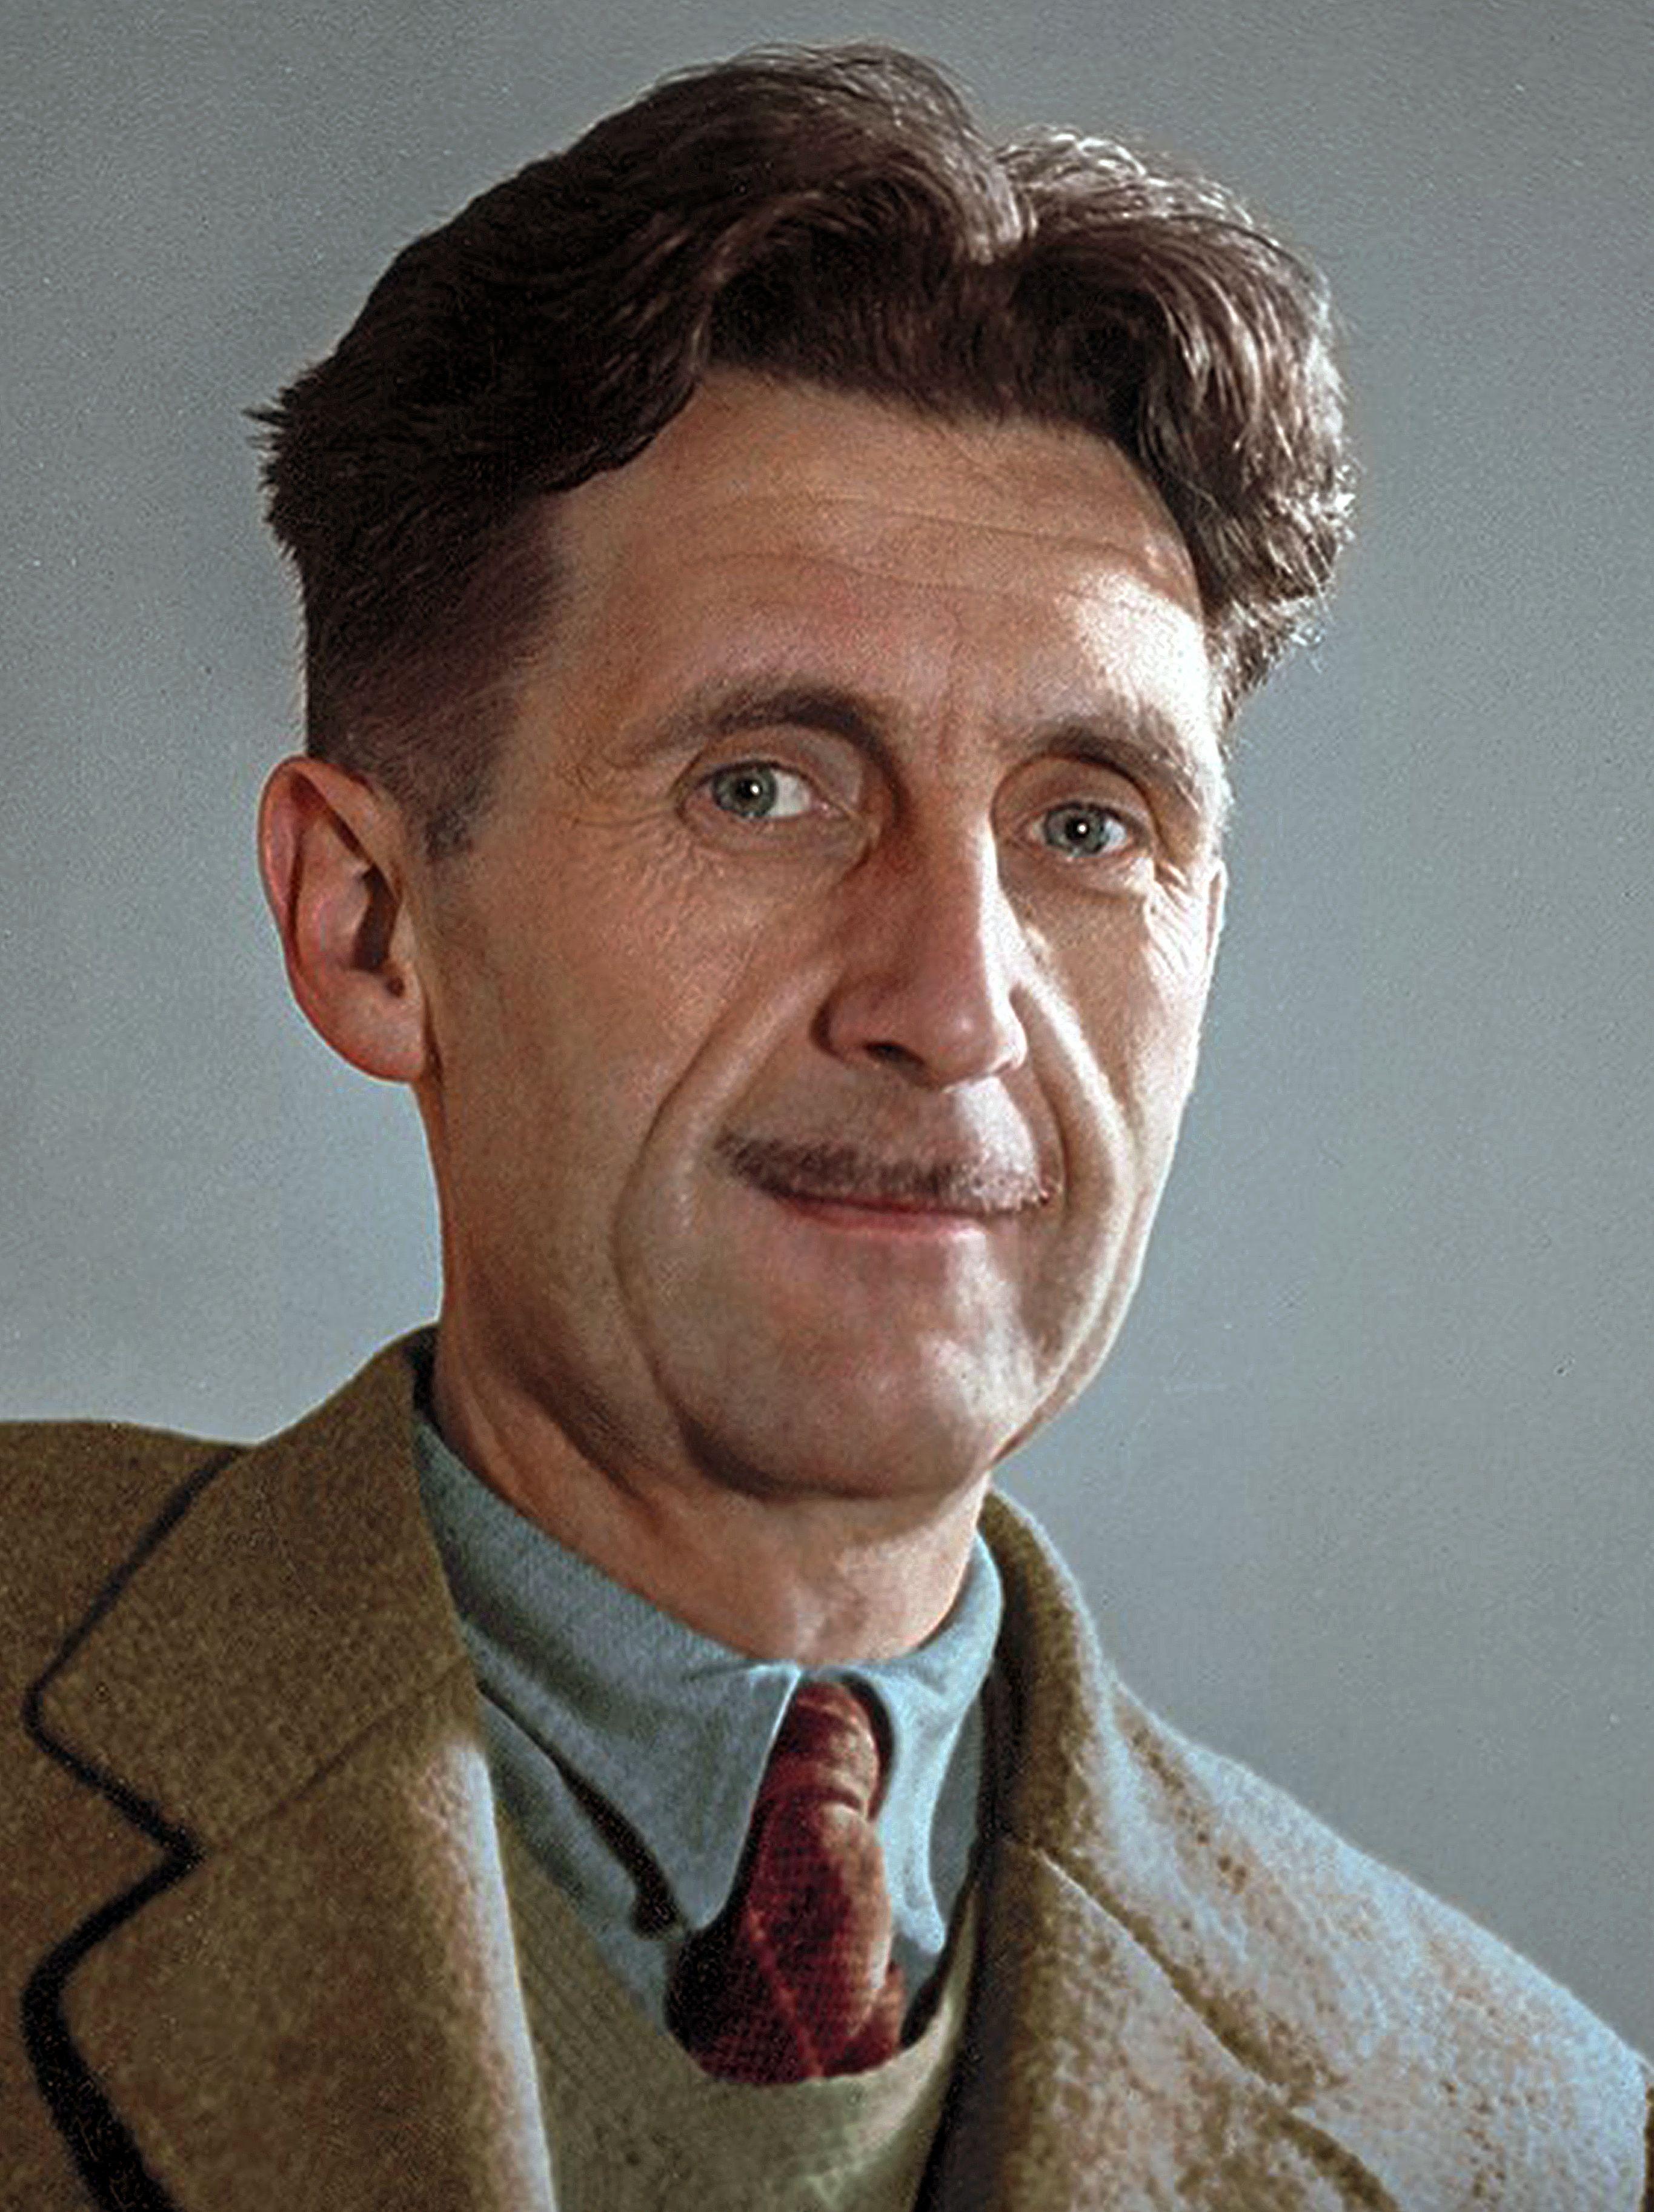 George Orwell | George orwell, Famous authors, Orwell